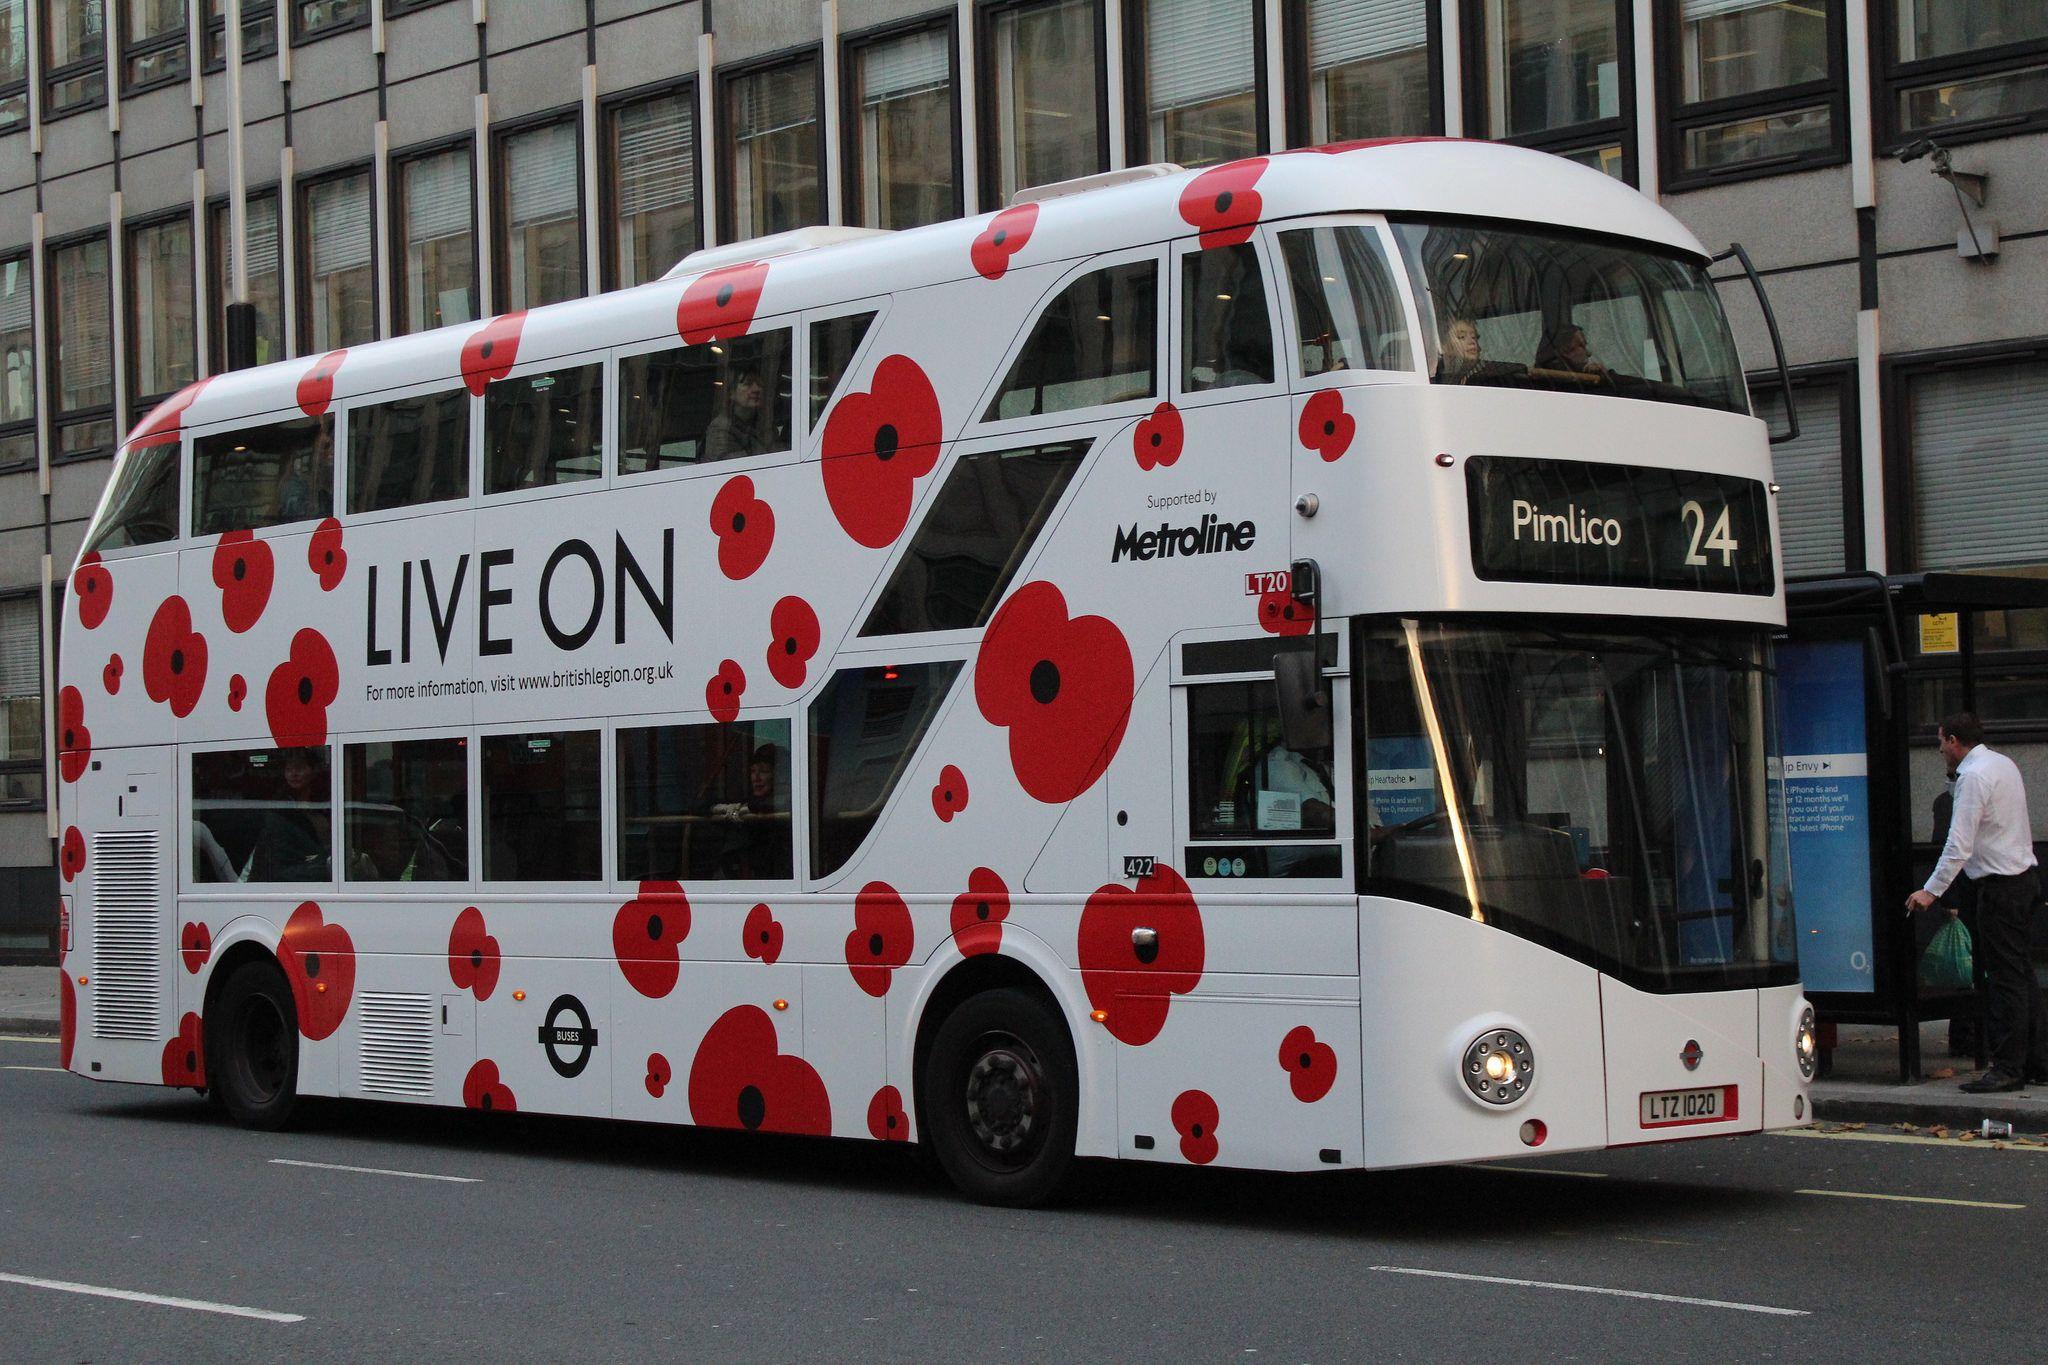 Lt20 Ltz1020 Metroline New Routemaster Routemaster London Bus